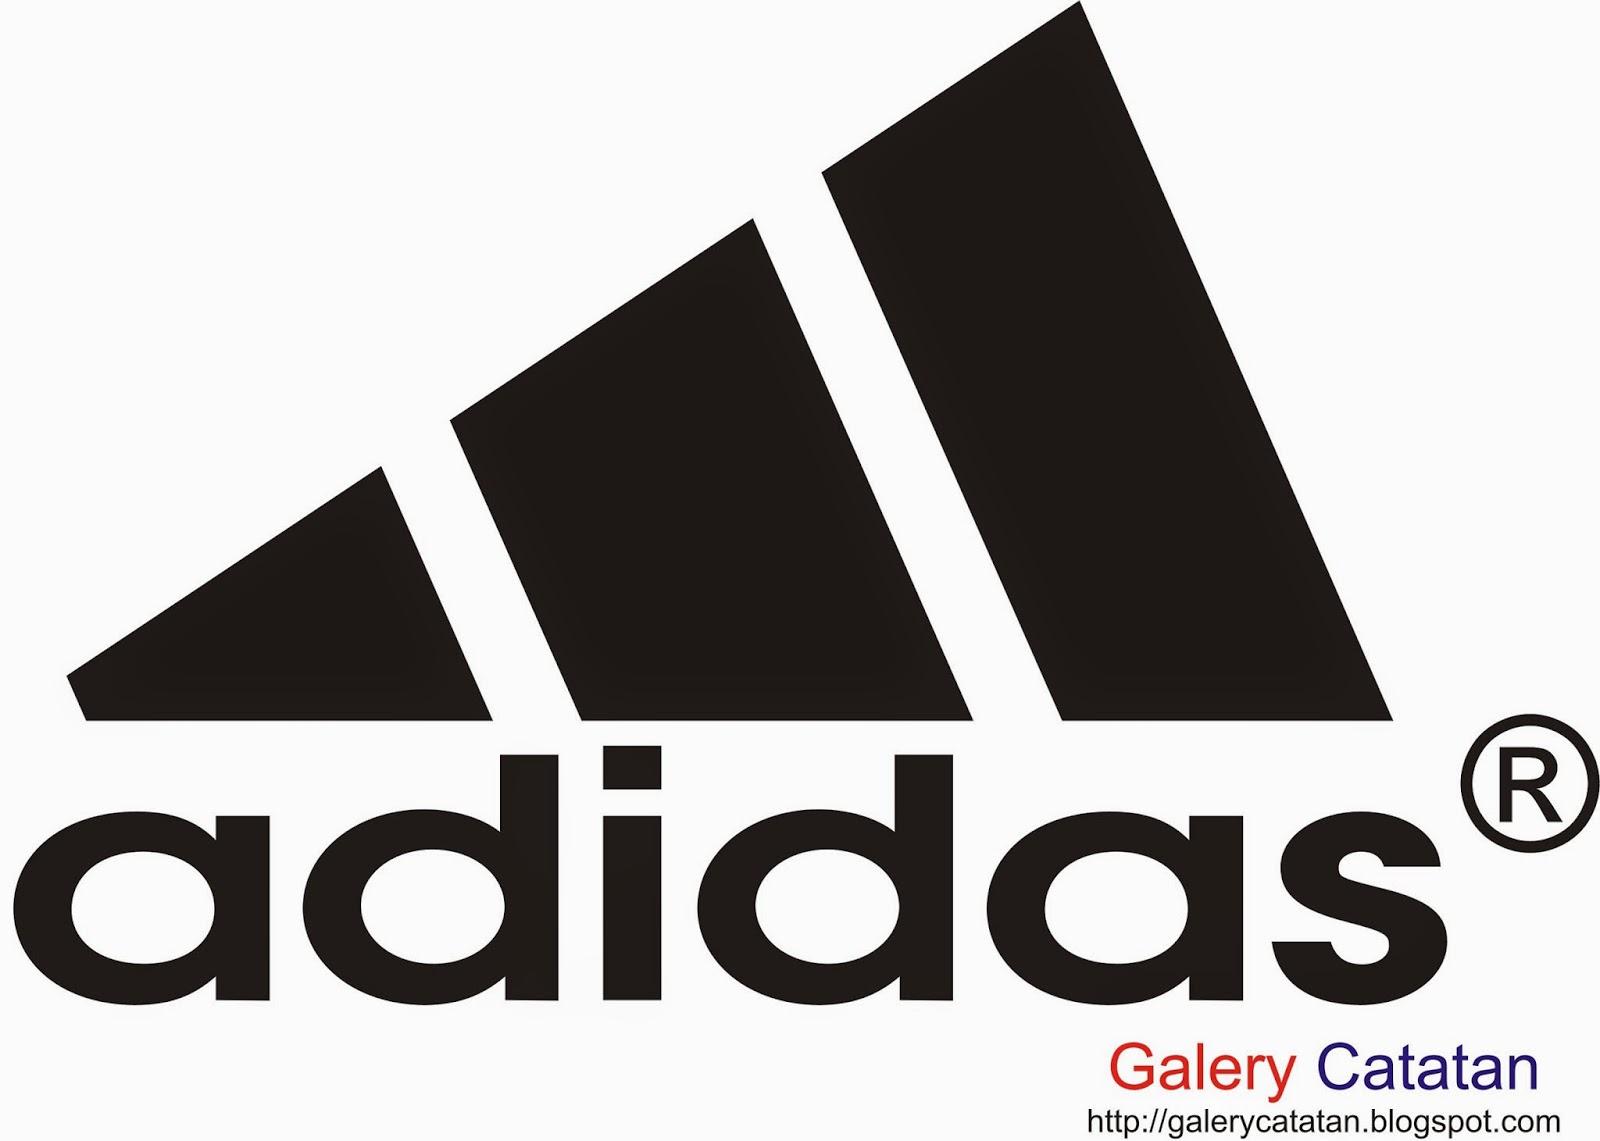 White Home Office Membuat Desain Logo Adidas Tips Komputer Trik Komputer